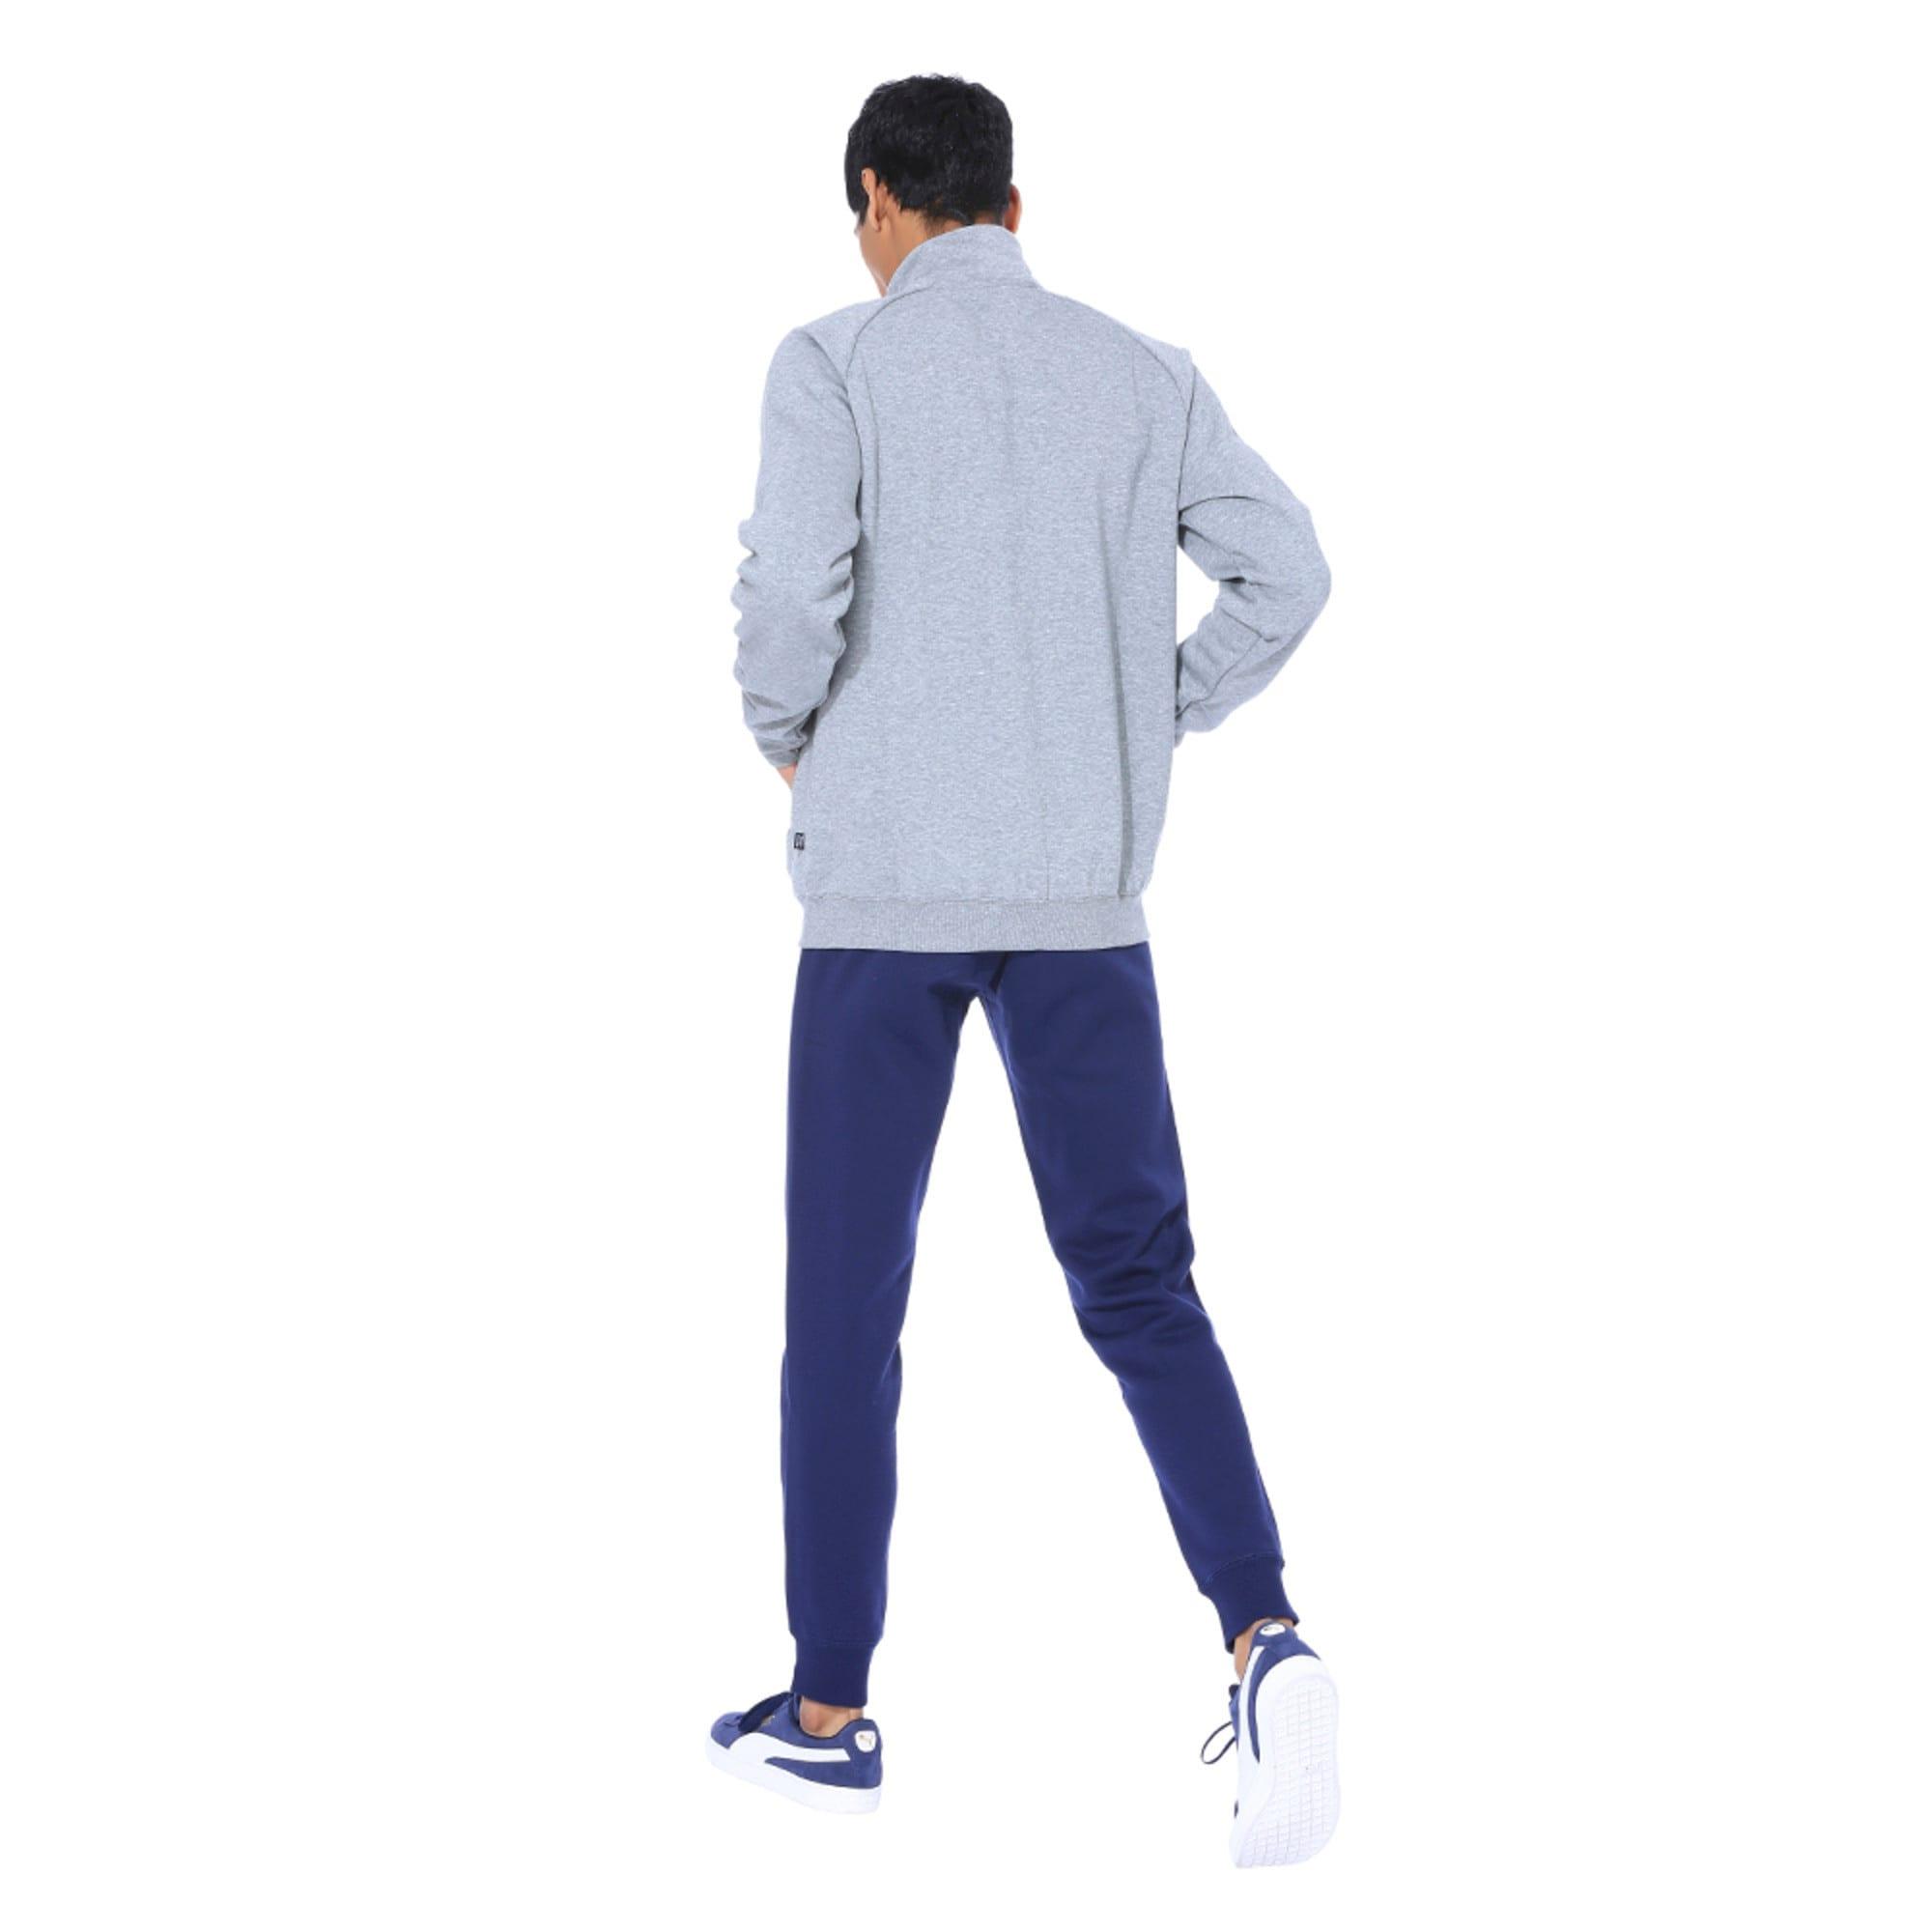 Thumbnail 4 of Clean CL Men's Sweat Suit, Medium Gray Heather, medium-IND